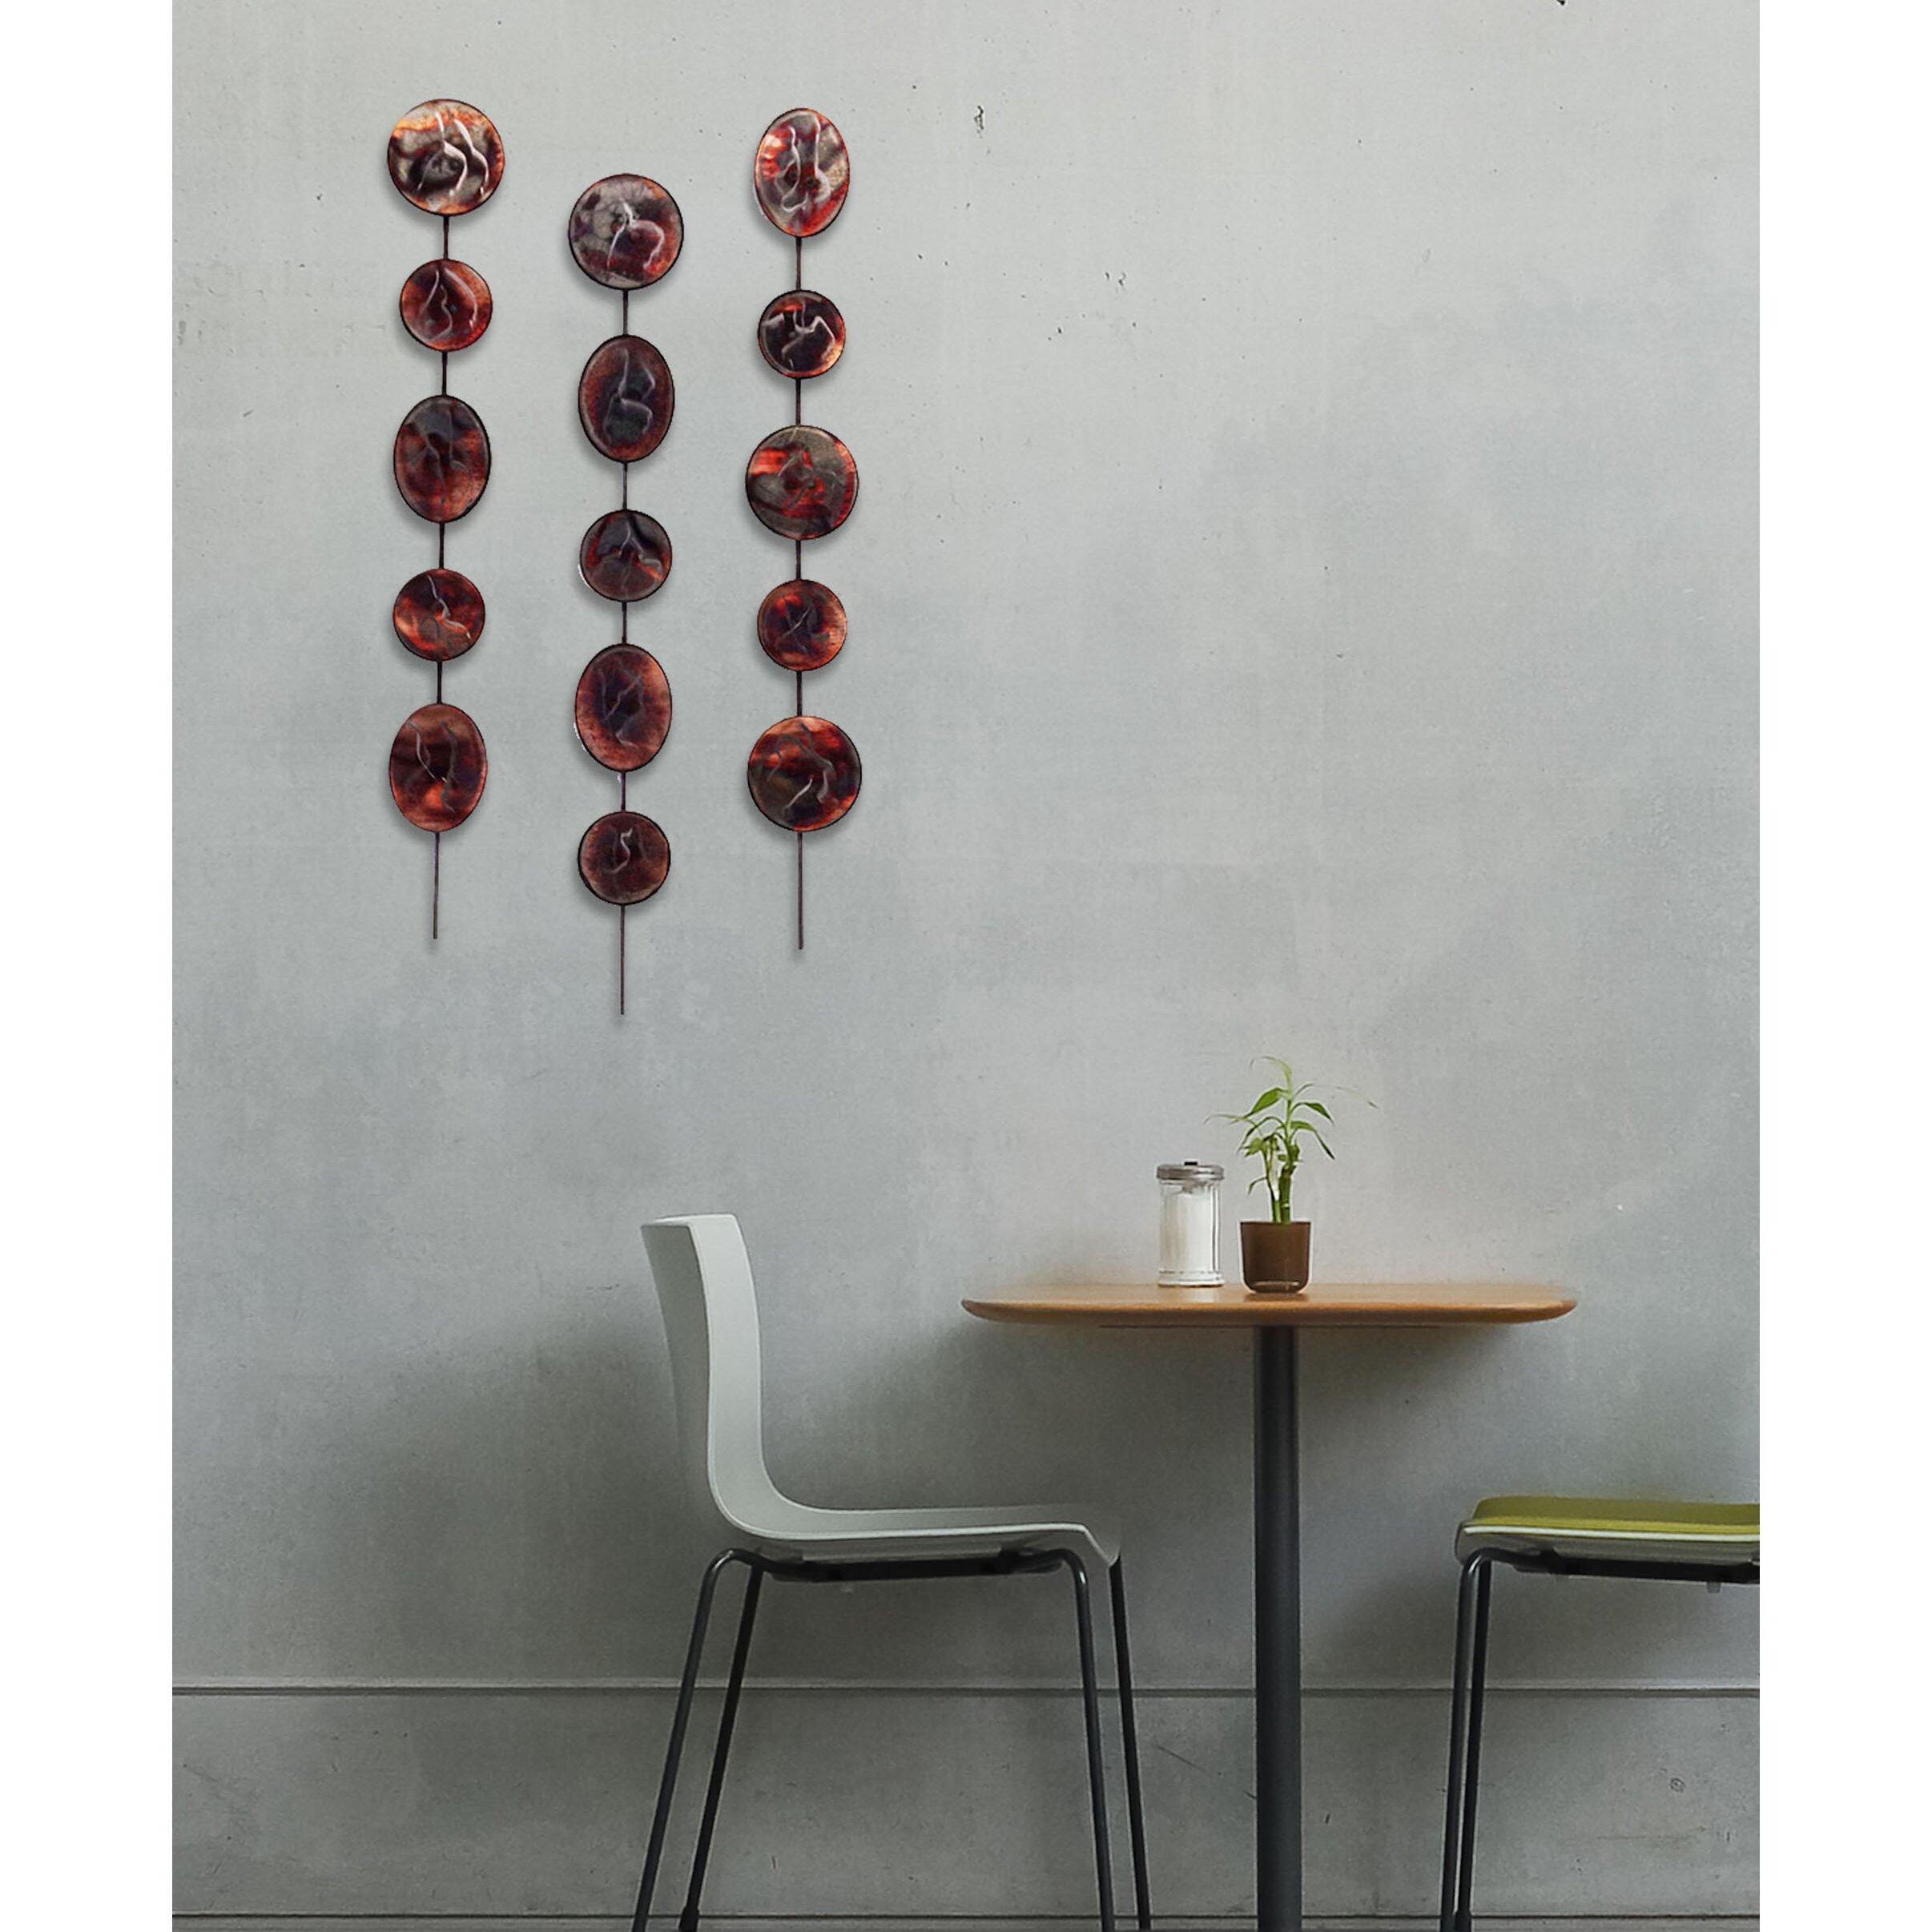 7055 inc 3 piece artisan grape stix wall d cor set. Black Bedroom Furniture Sets. Home Design Ideas